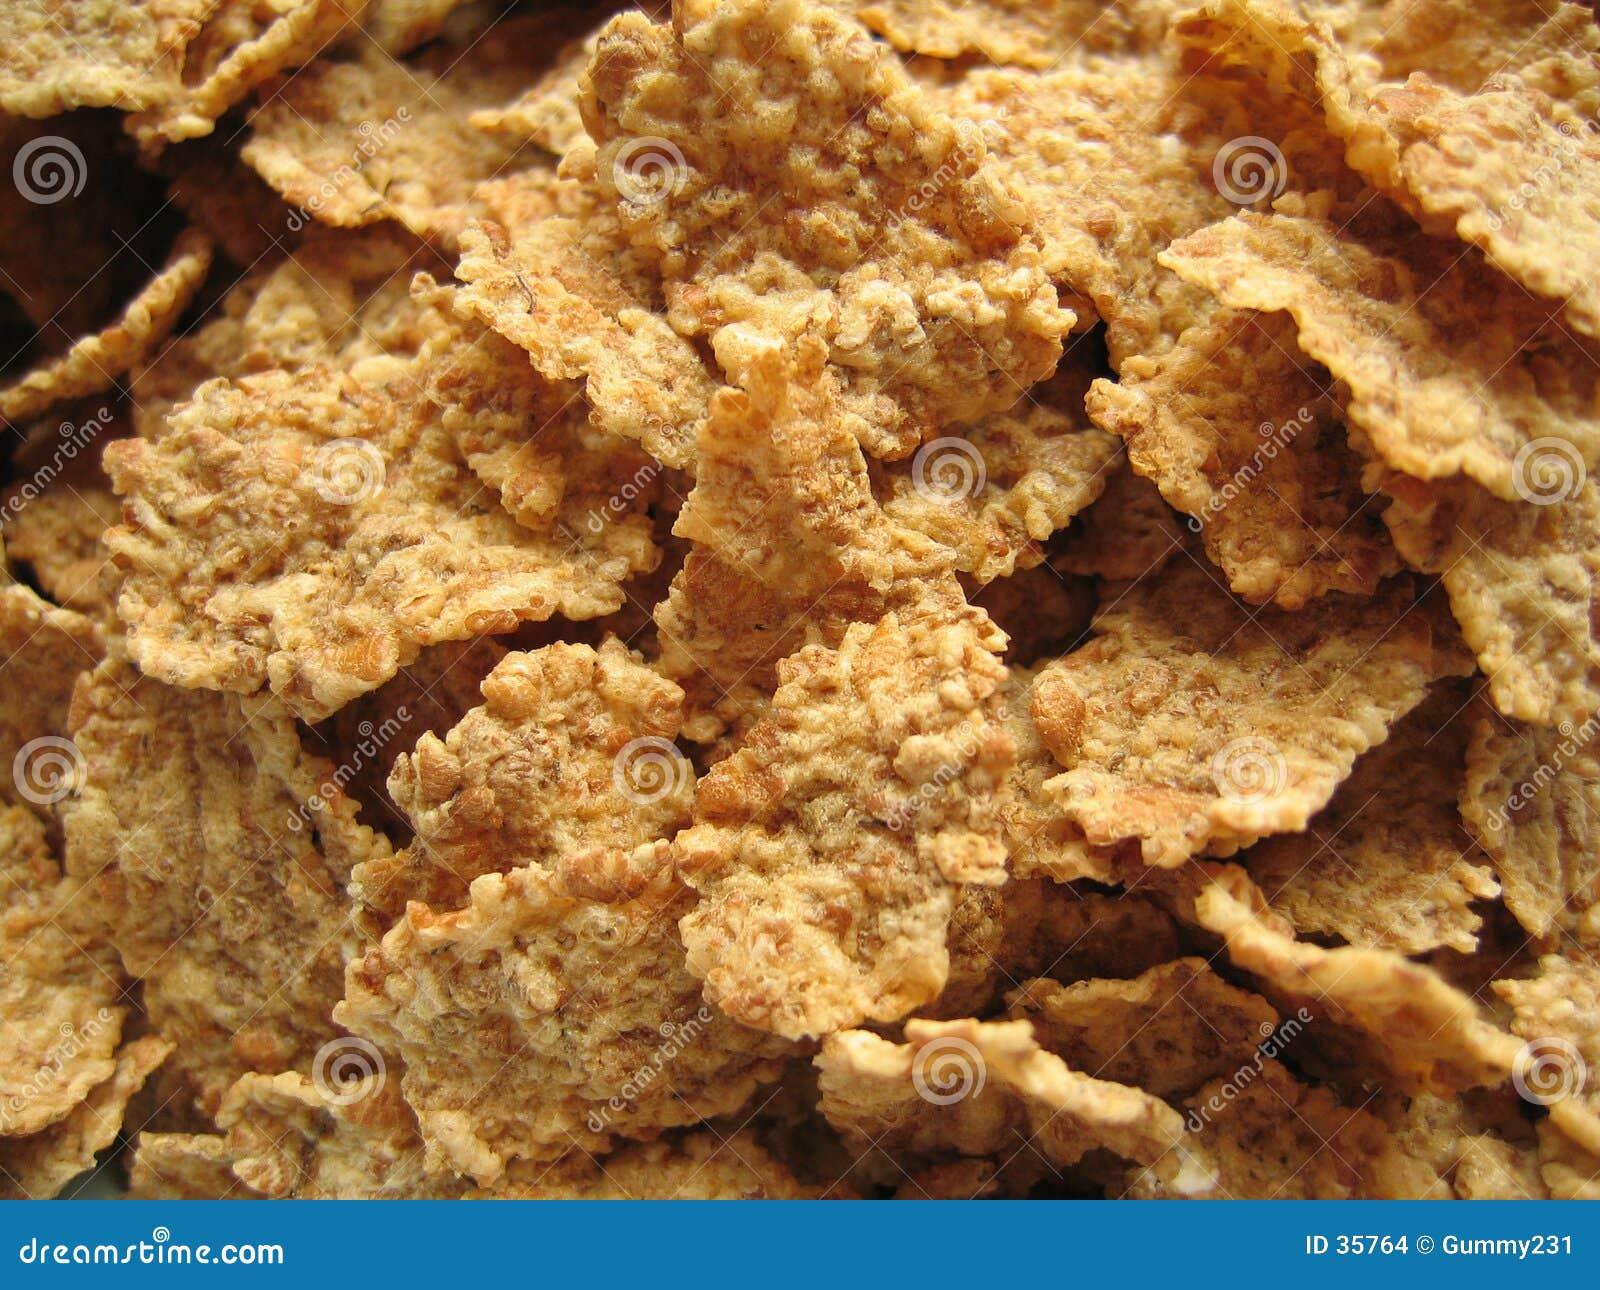 Brown Flakes